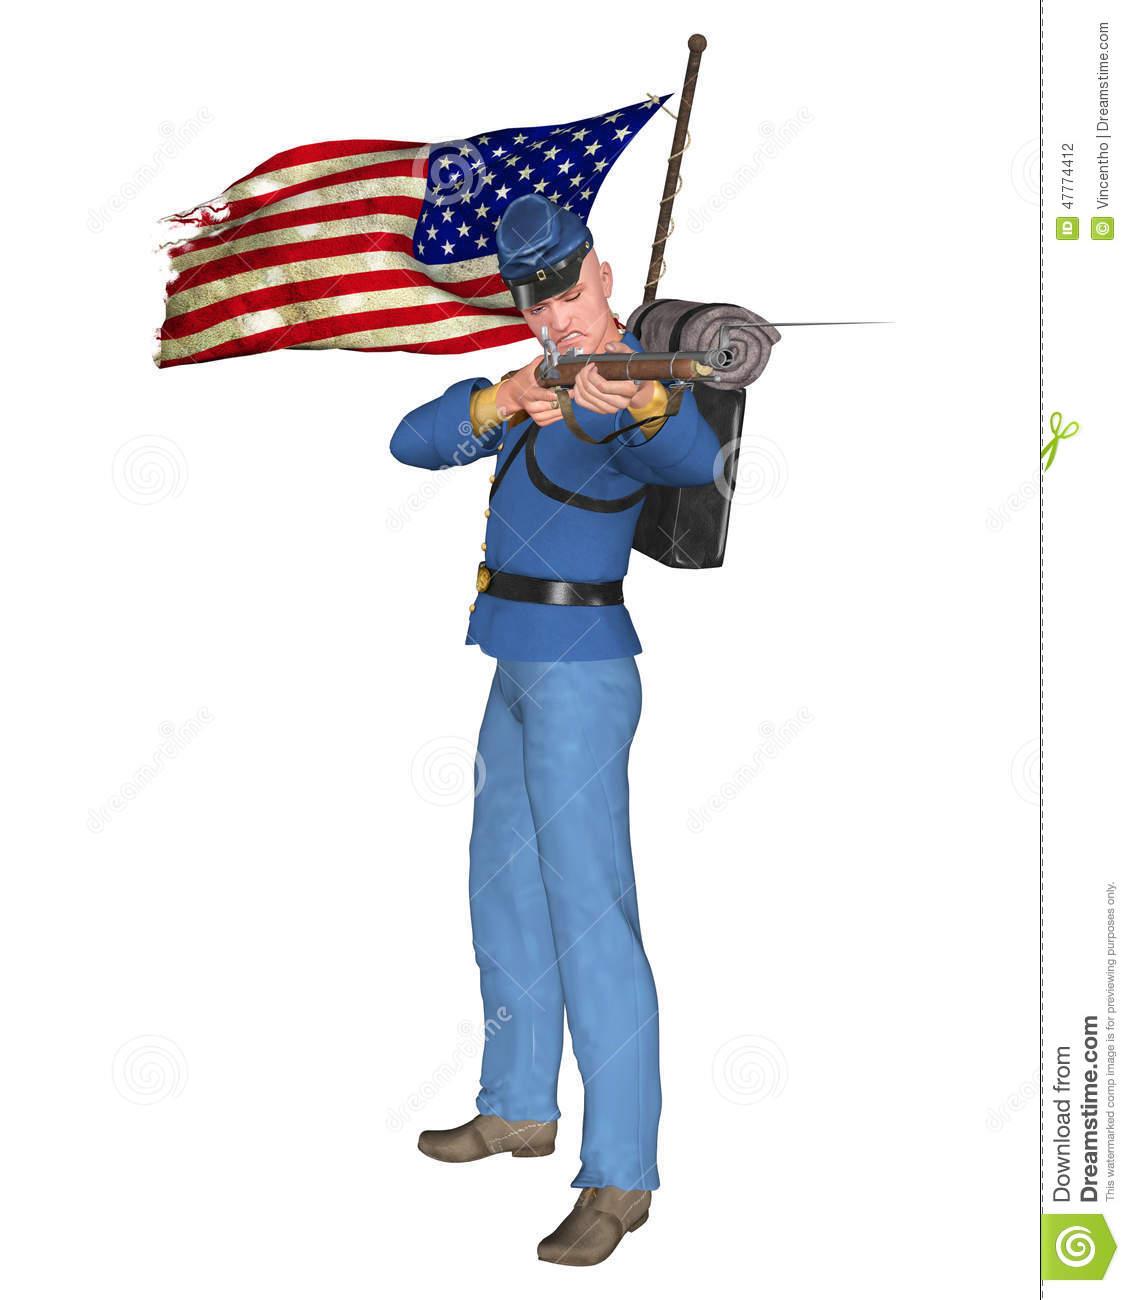 Civil war soldier clipart.